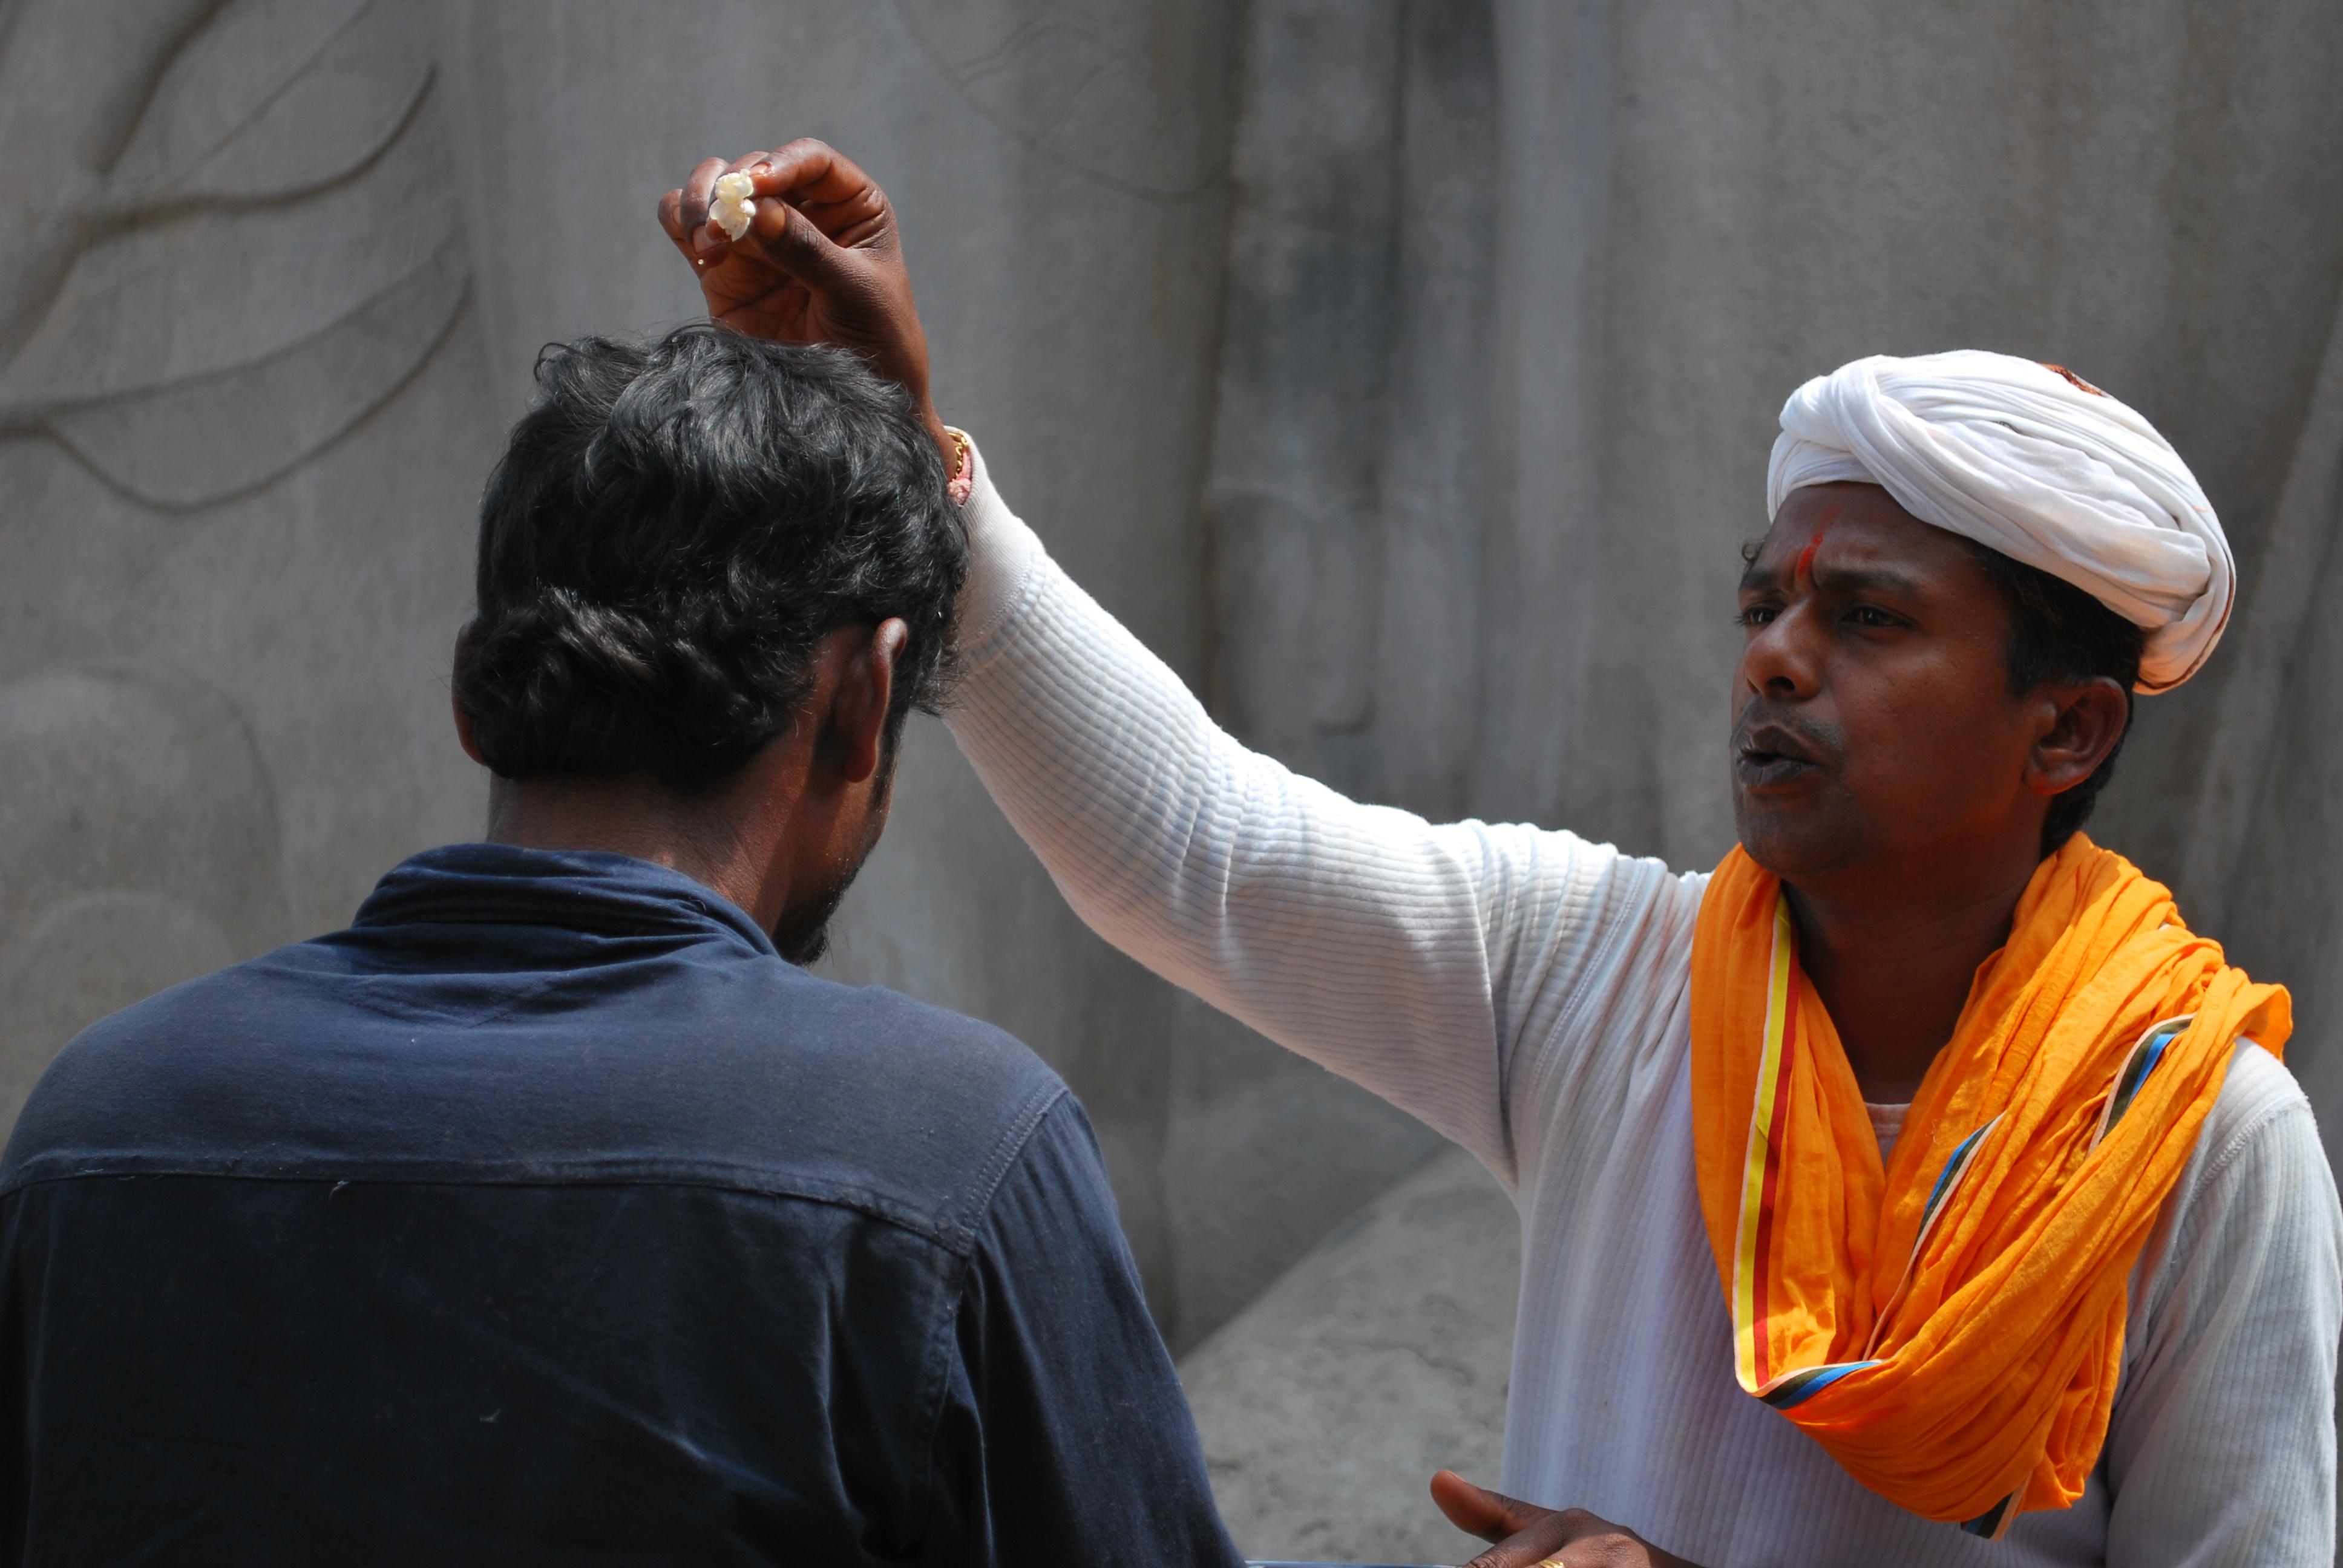 File:Hindu-priest-blessing.jpg - Wikimedia Commons